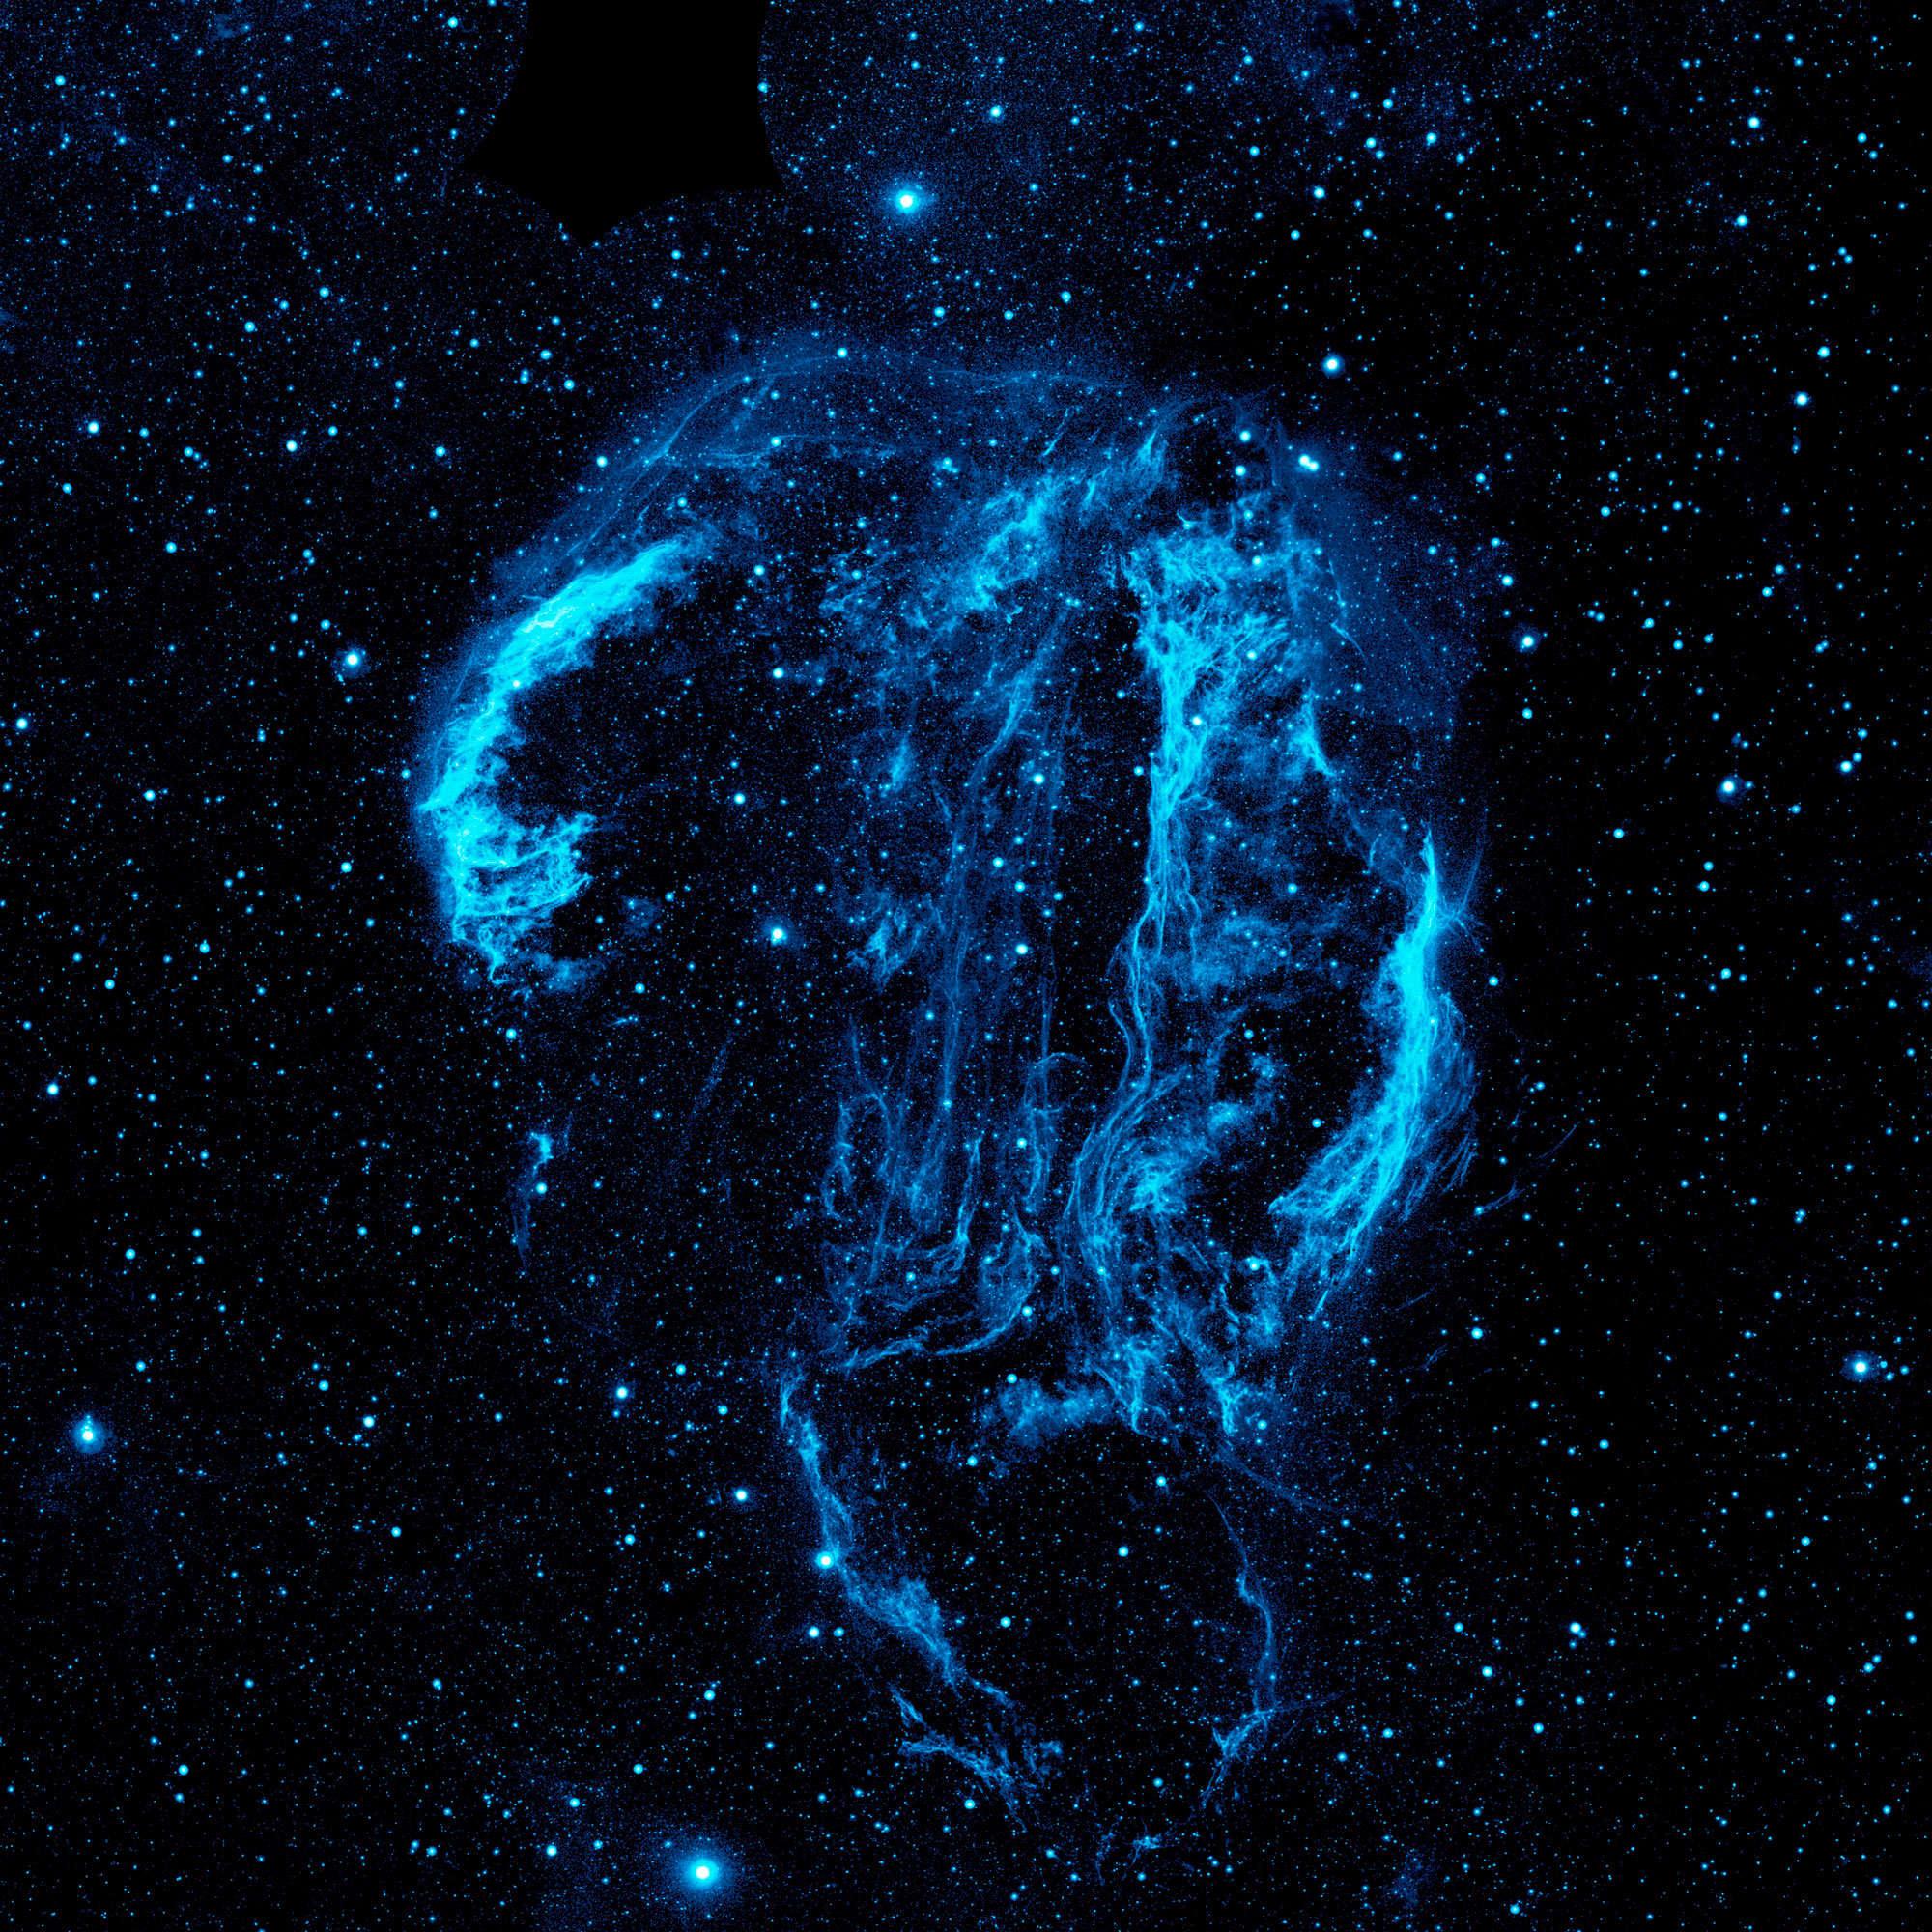 NASA - PIA15415